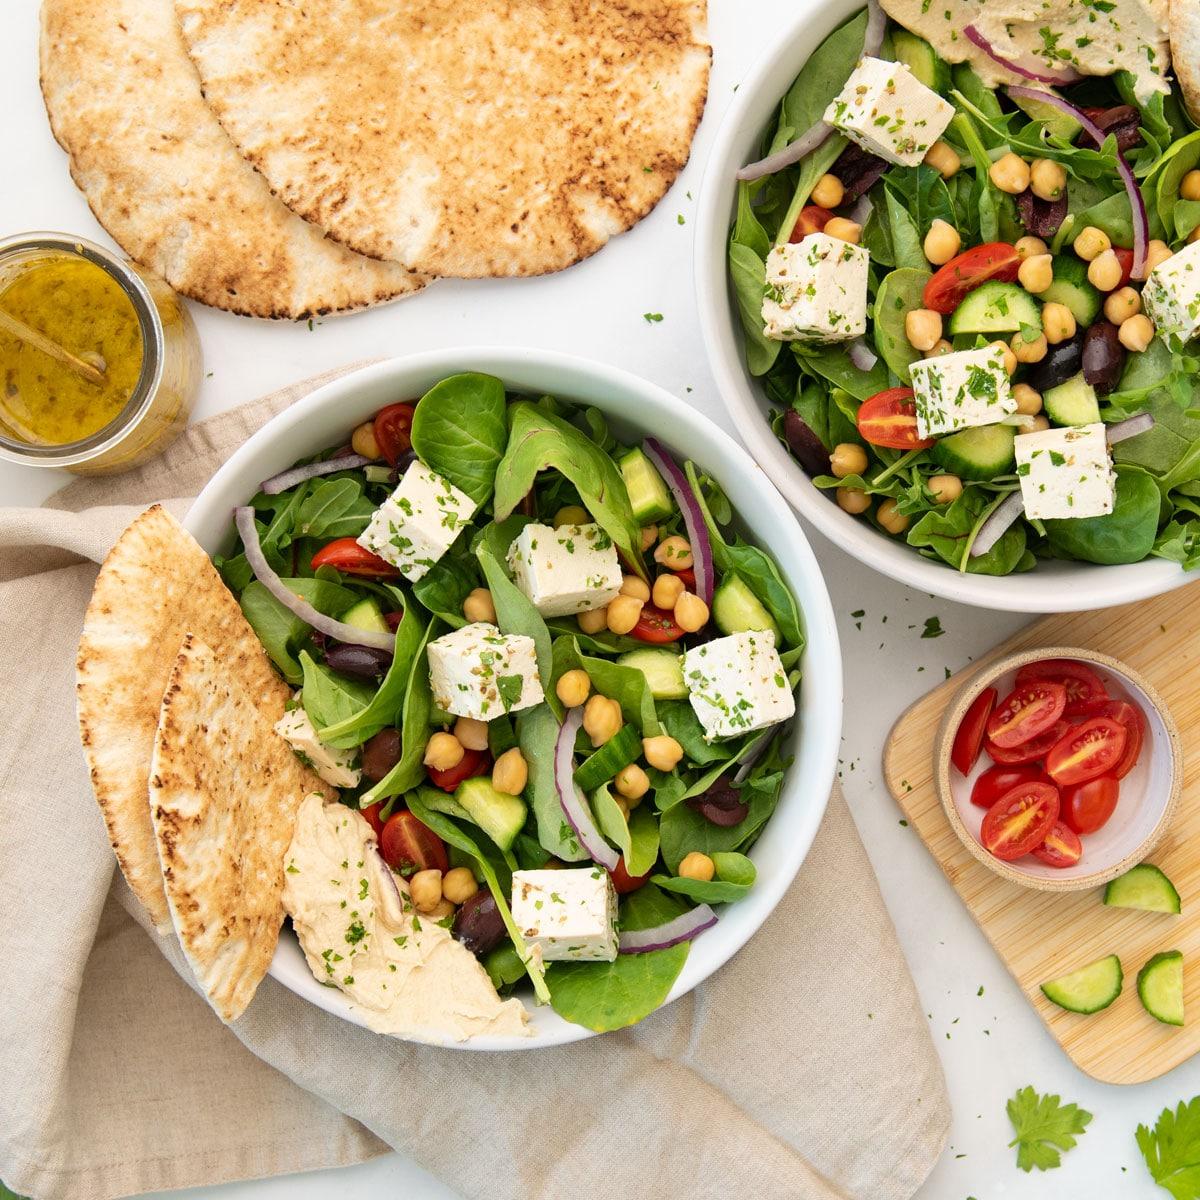 bowls of vegan greek salad loaded with veggies, feta, hummus, and slices of pita